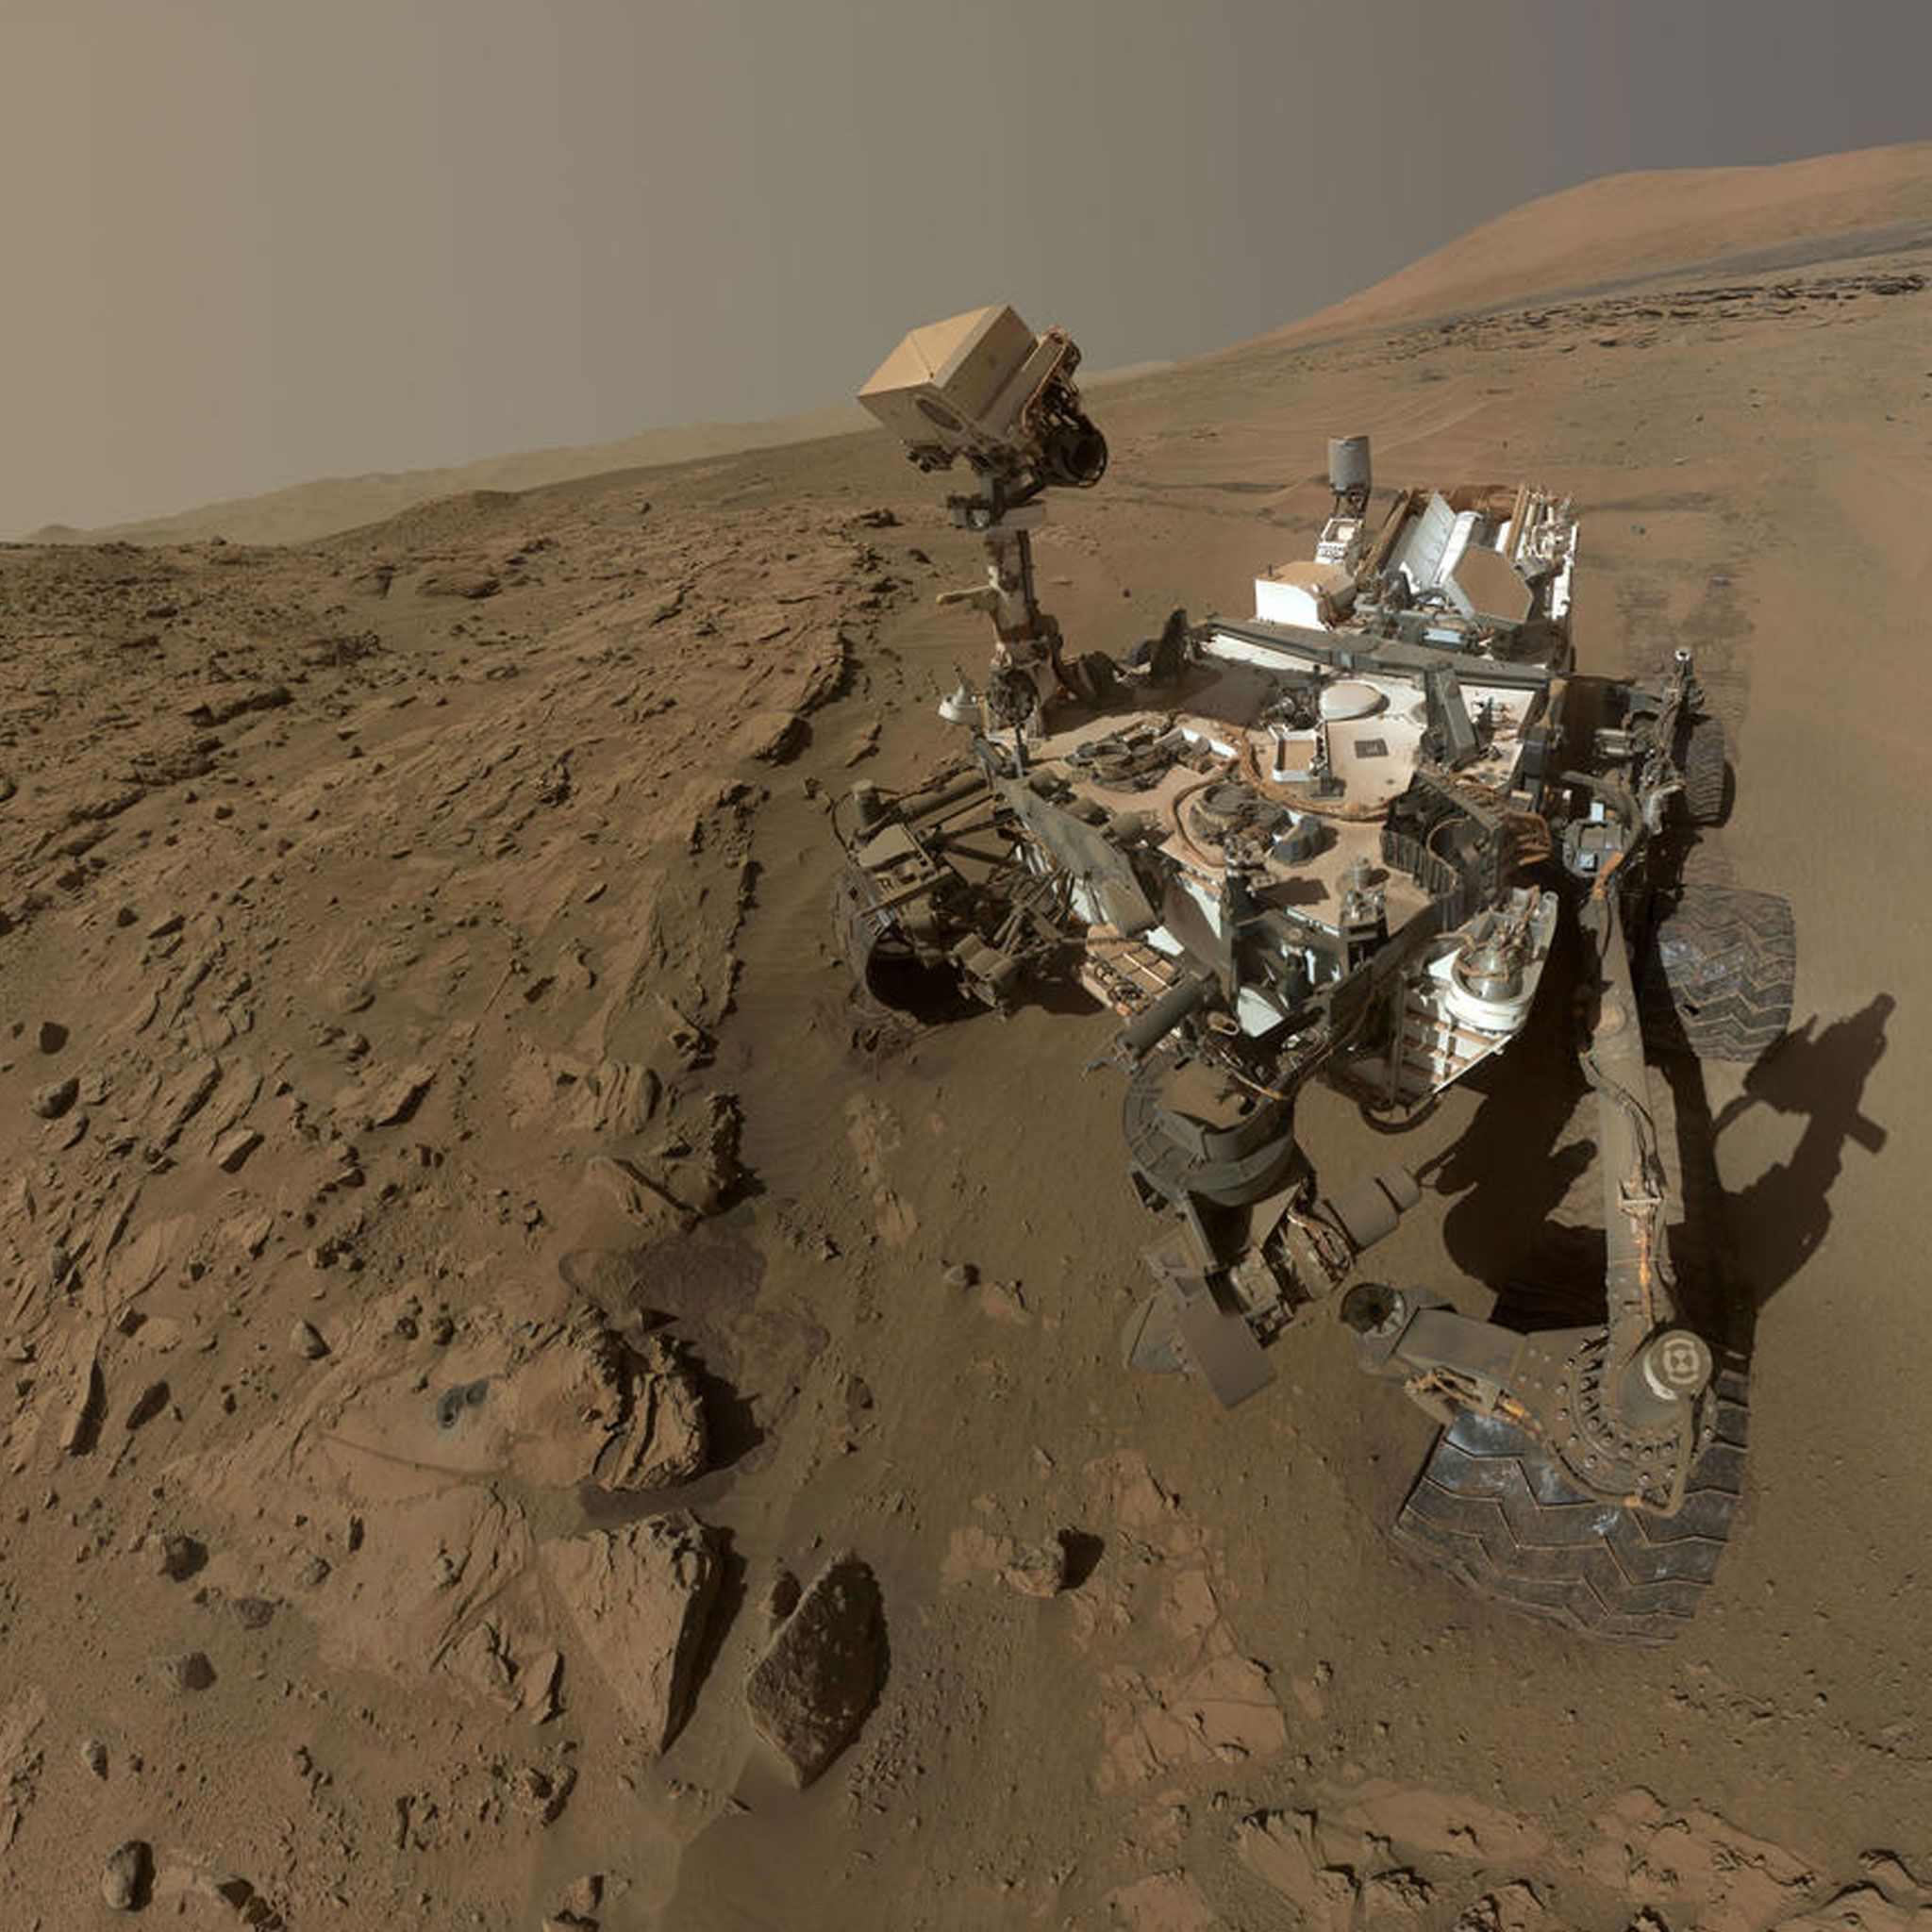 Raw Images Multimedia Nasa S Mars Exploration Program Curiosity Rover Earth And Solar System Mars Exploration